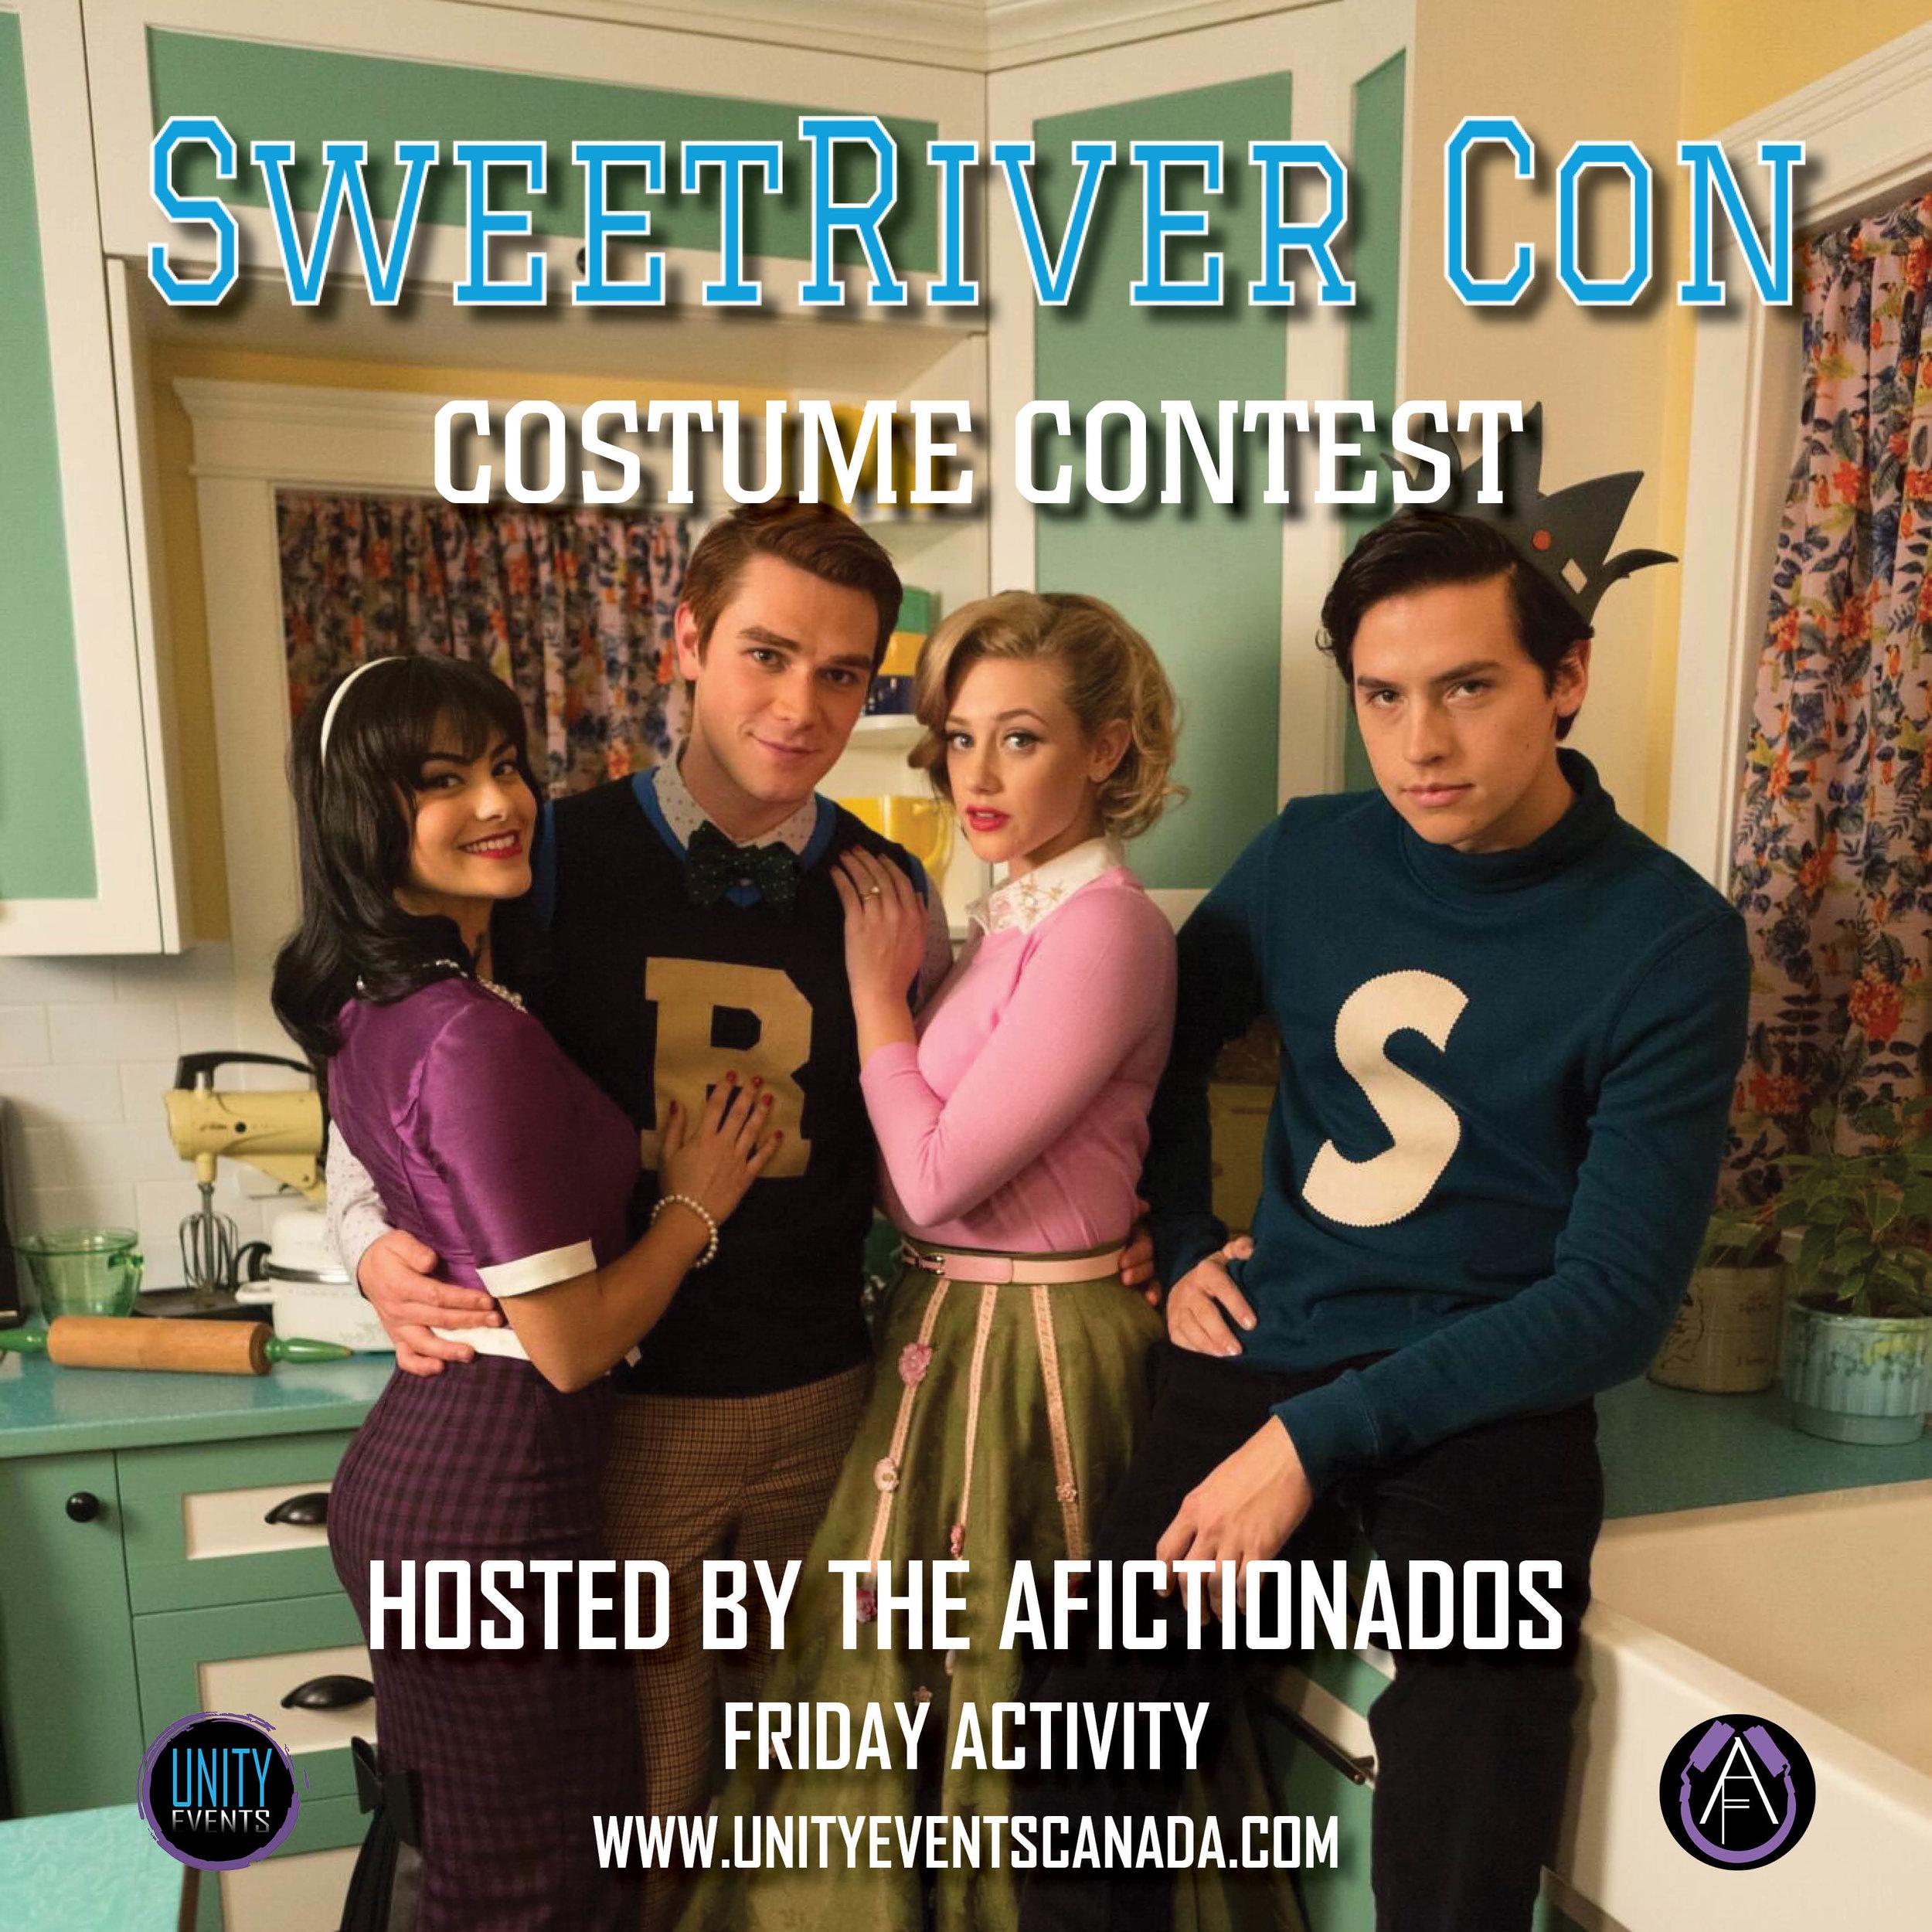 website costume contest2.jpg